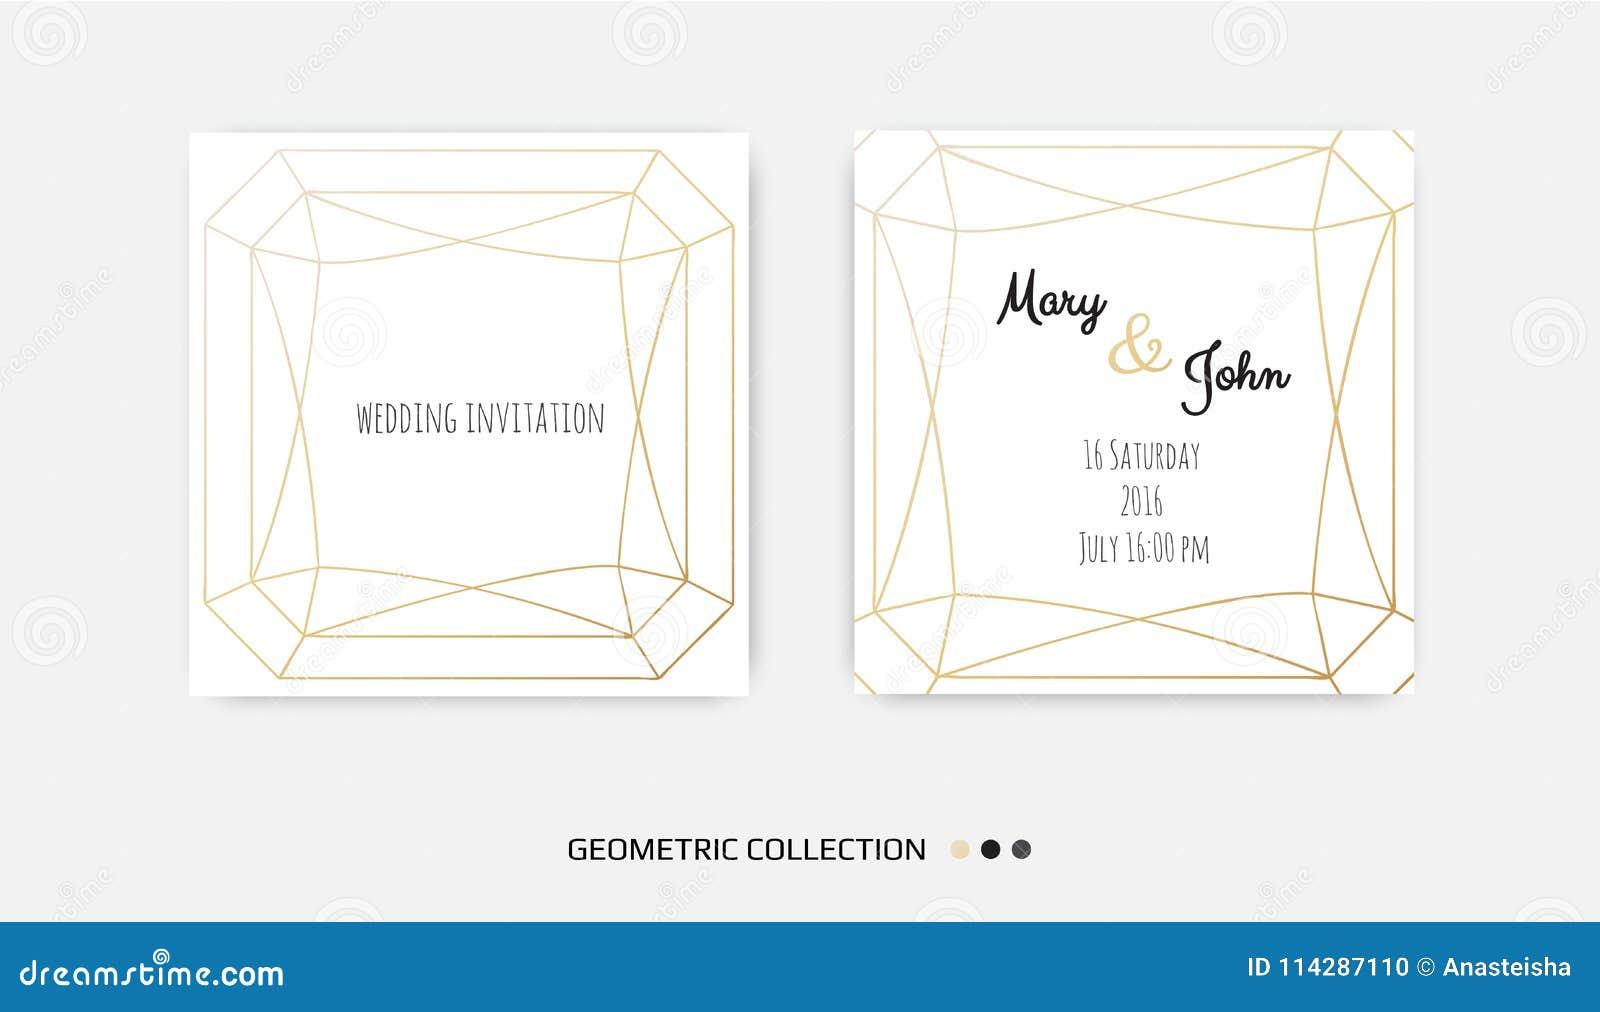 Wedding Invitation Invite Card Design With Geometrical Art